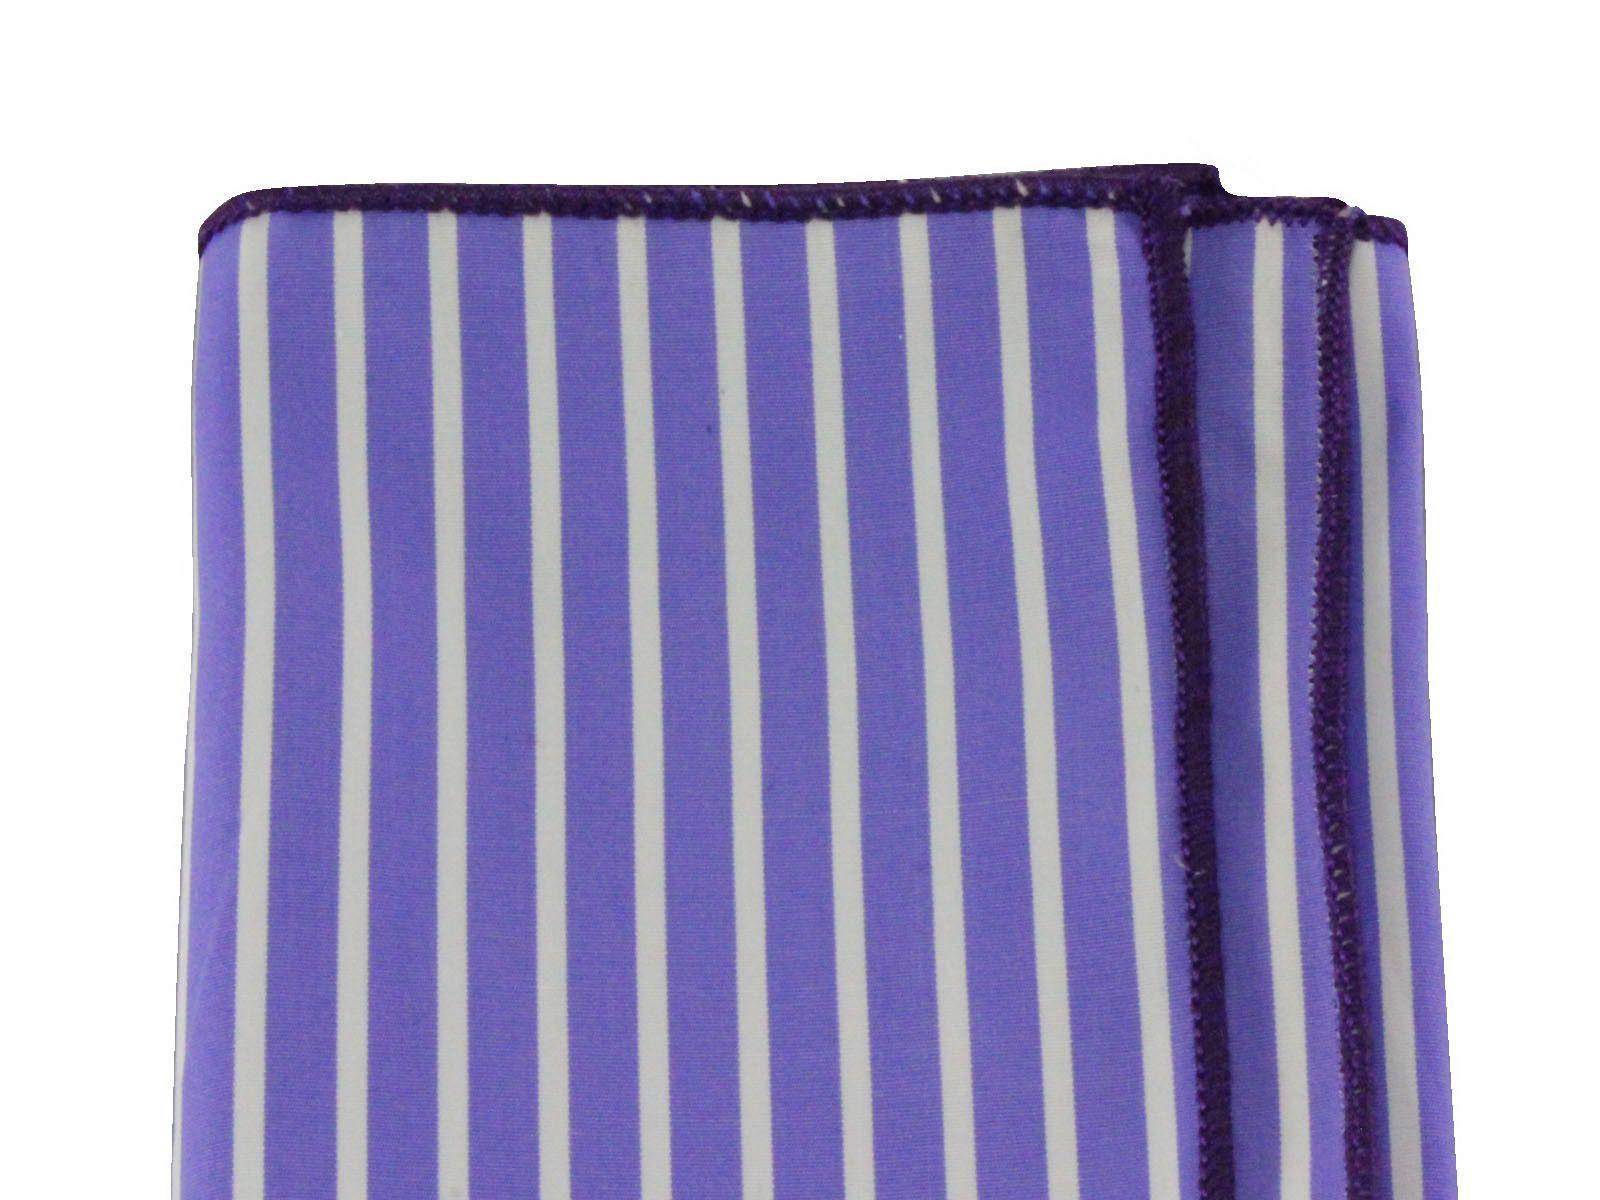 Periwinkle Striped Cotton Pocket Square